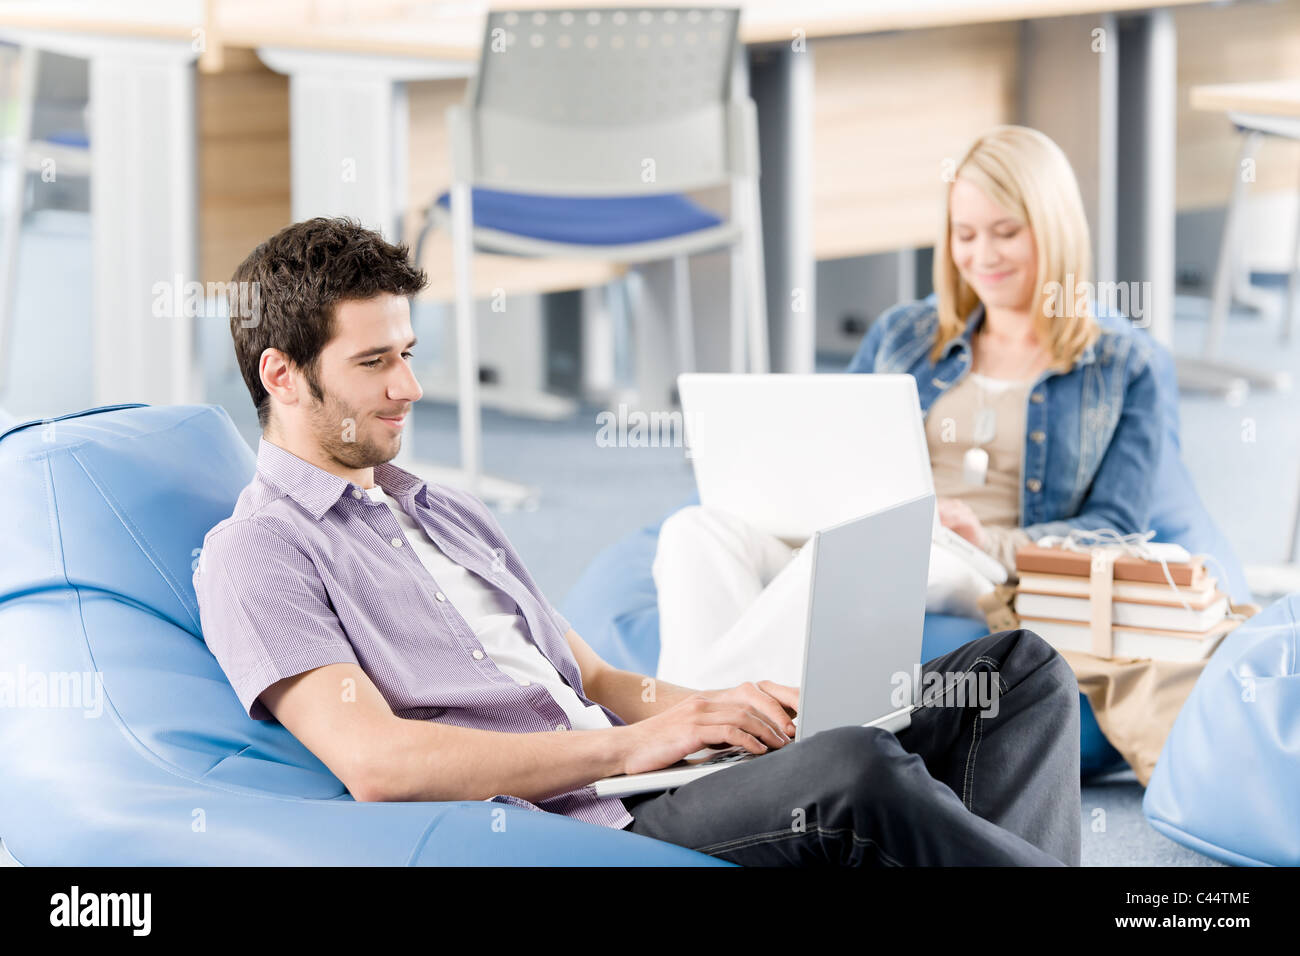 Schüler an der High School oder Universität arbeiten auf dem Laptop zu studieren Stockbild